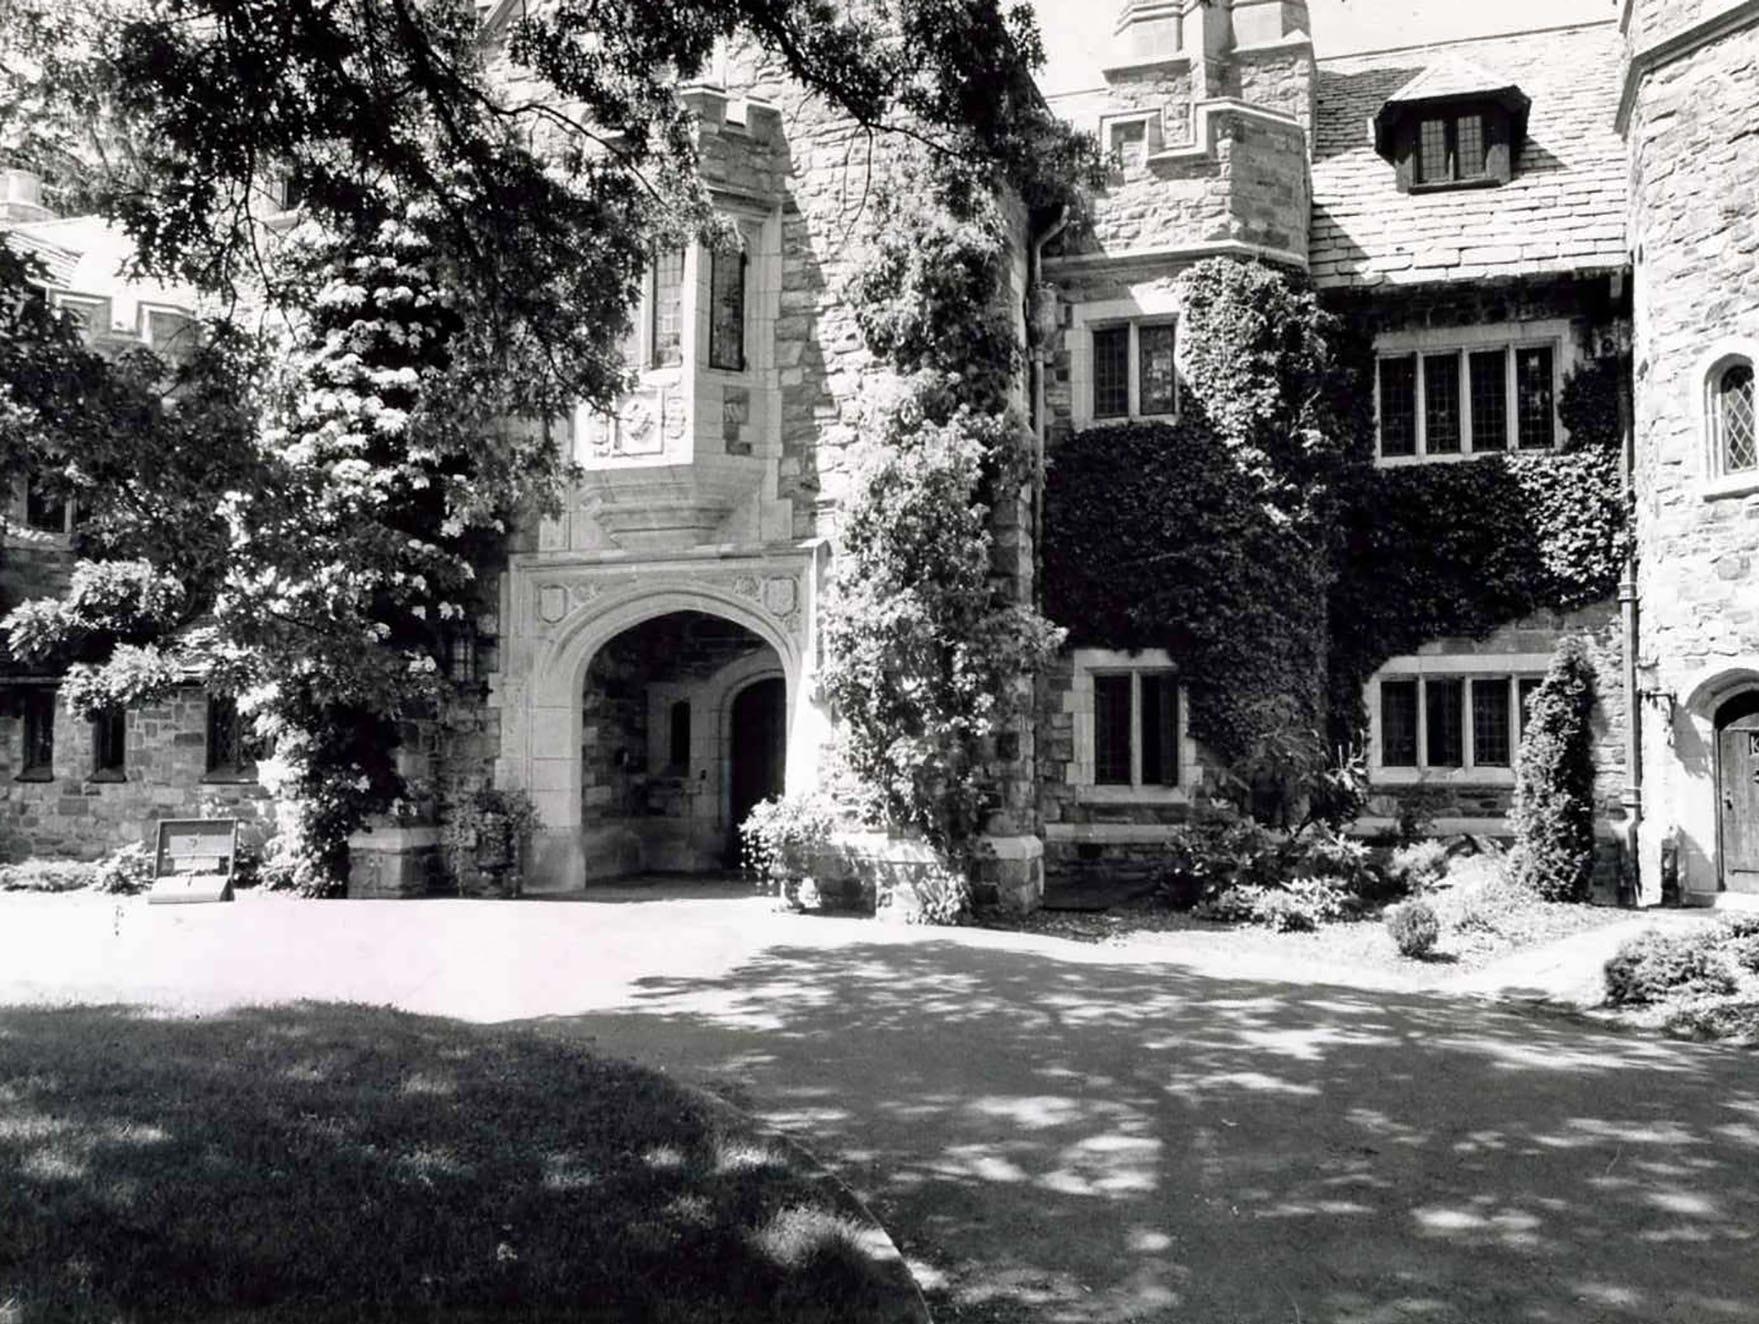 June, 9, 1982: Ringwood State Park